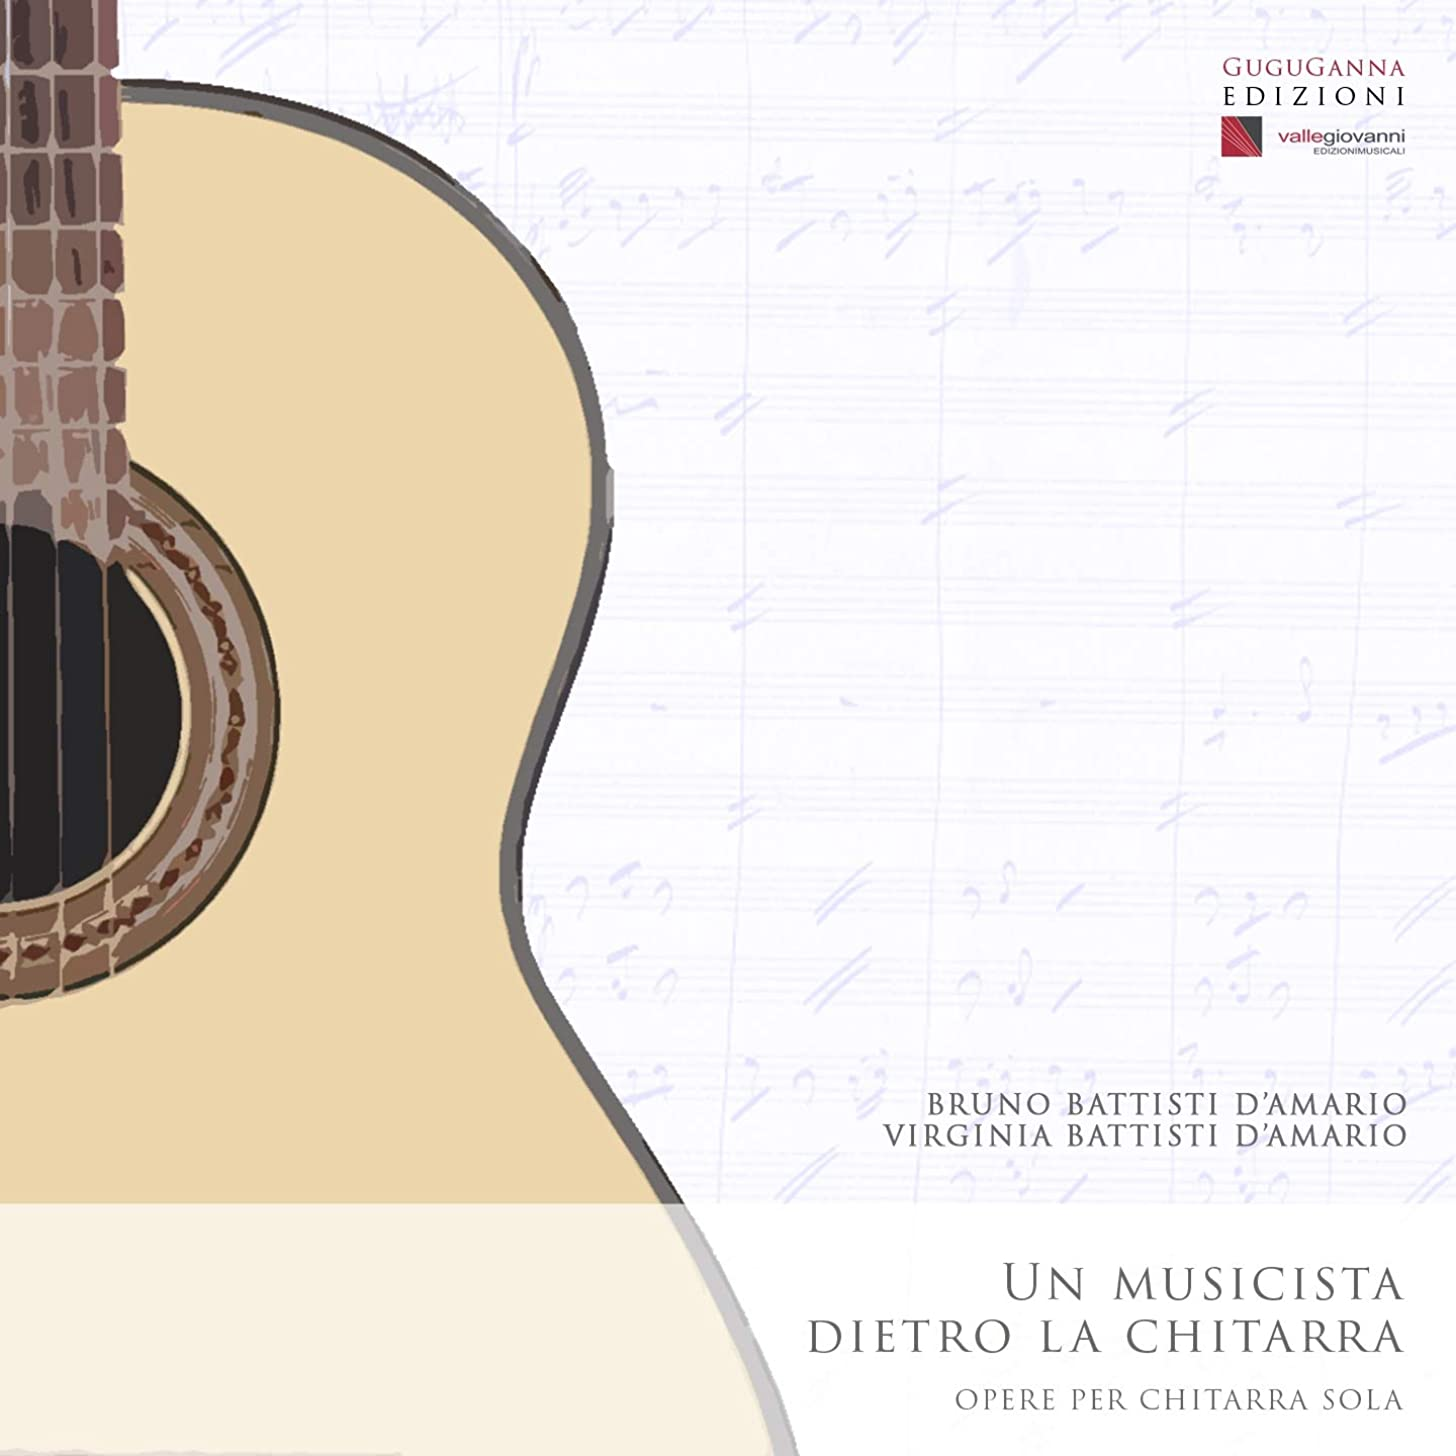 Piccola Suite: No. 3, Berceuse